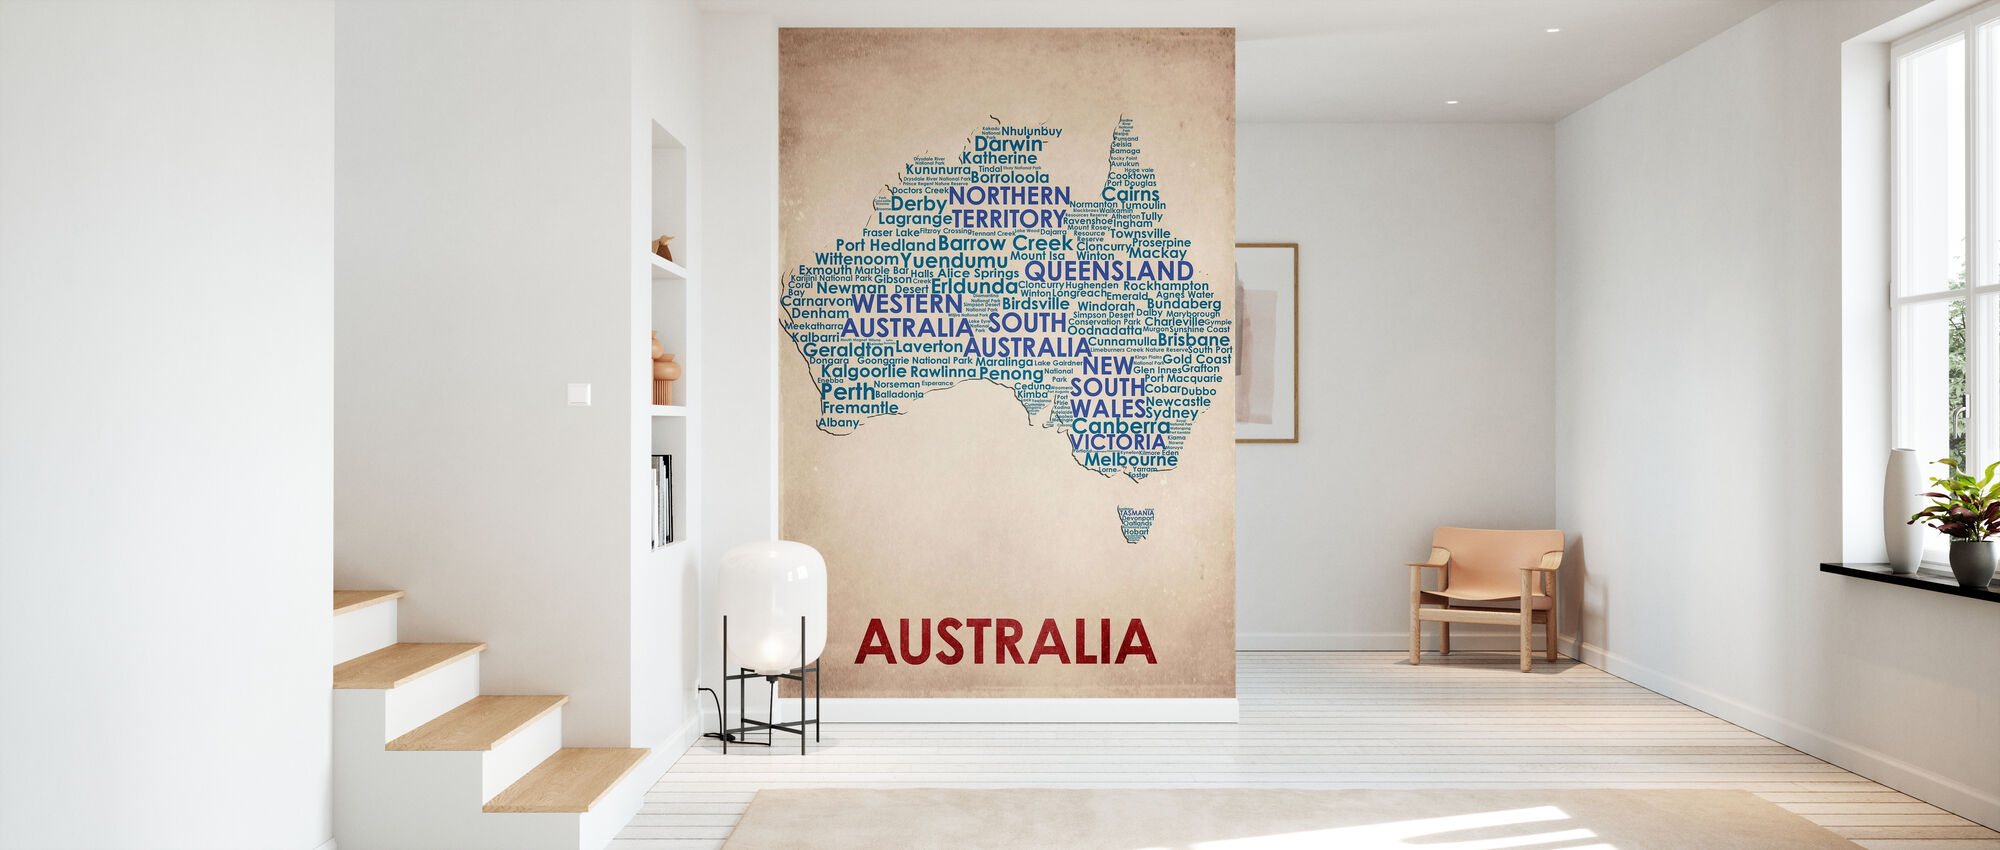 Australia Map - Wallpaper - Hallway